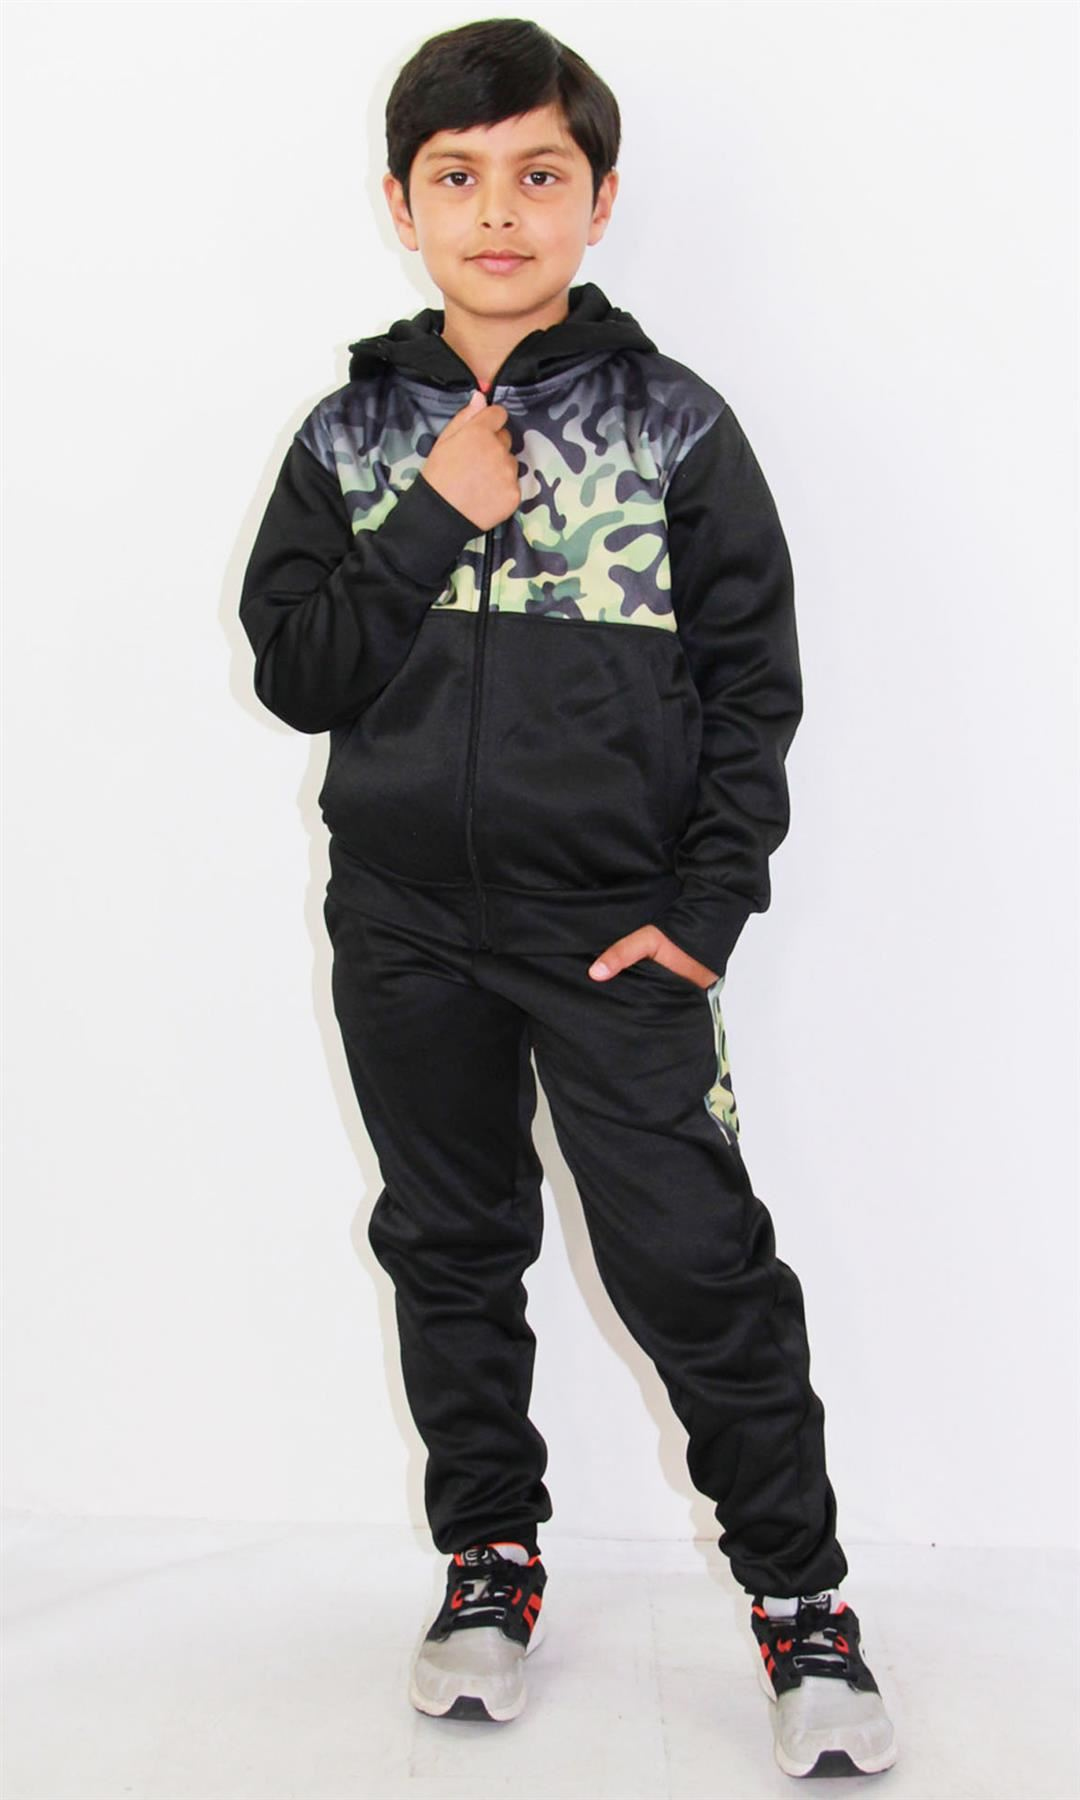 Kids Boys Girls Tracksuit Camouflage Panelled Teal Hooded Top Bottom Joggingsuit